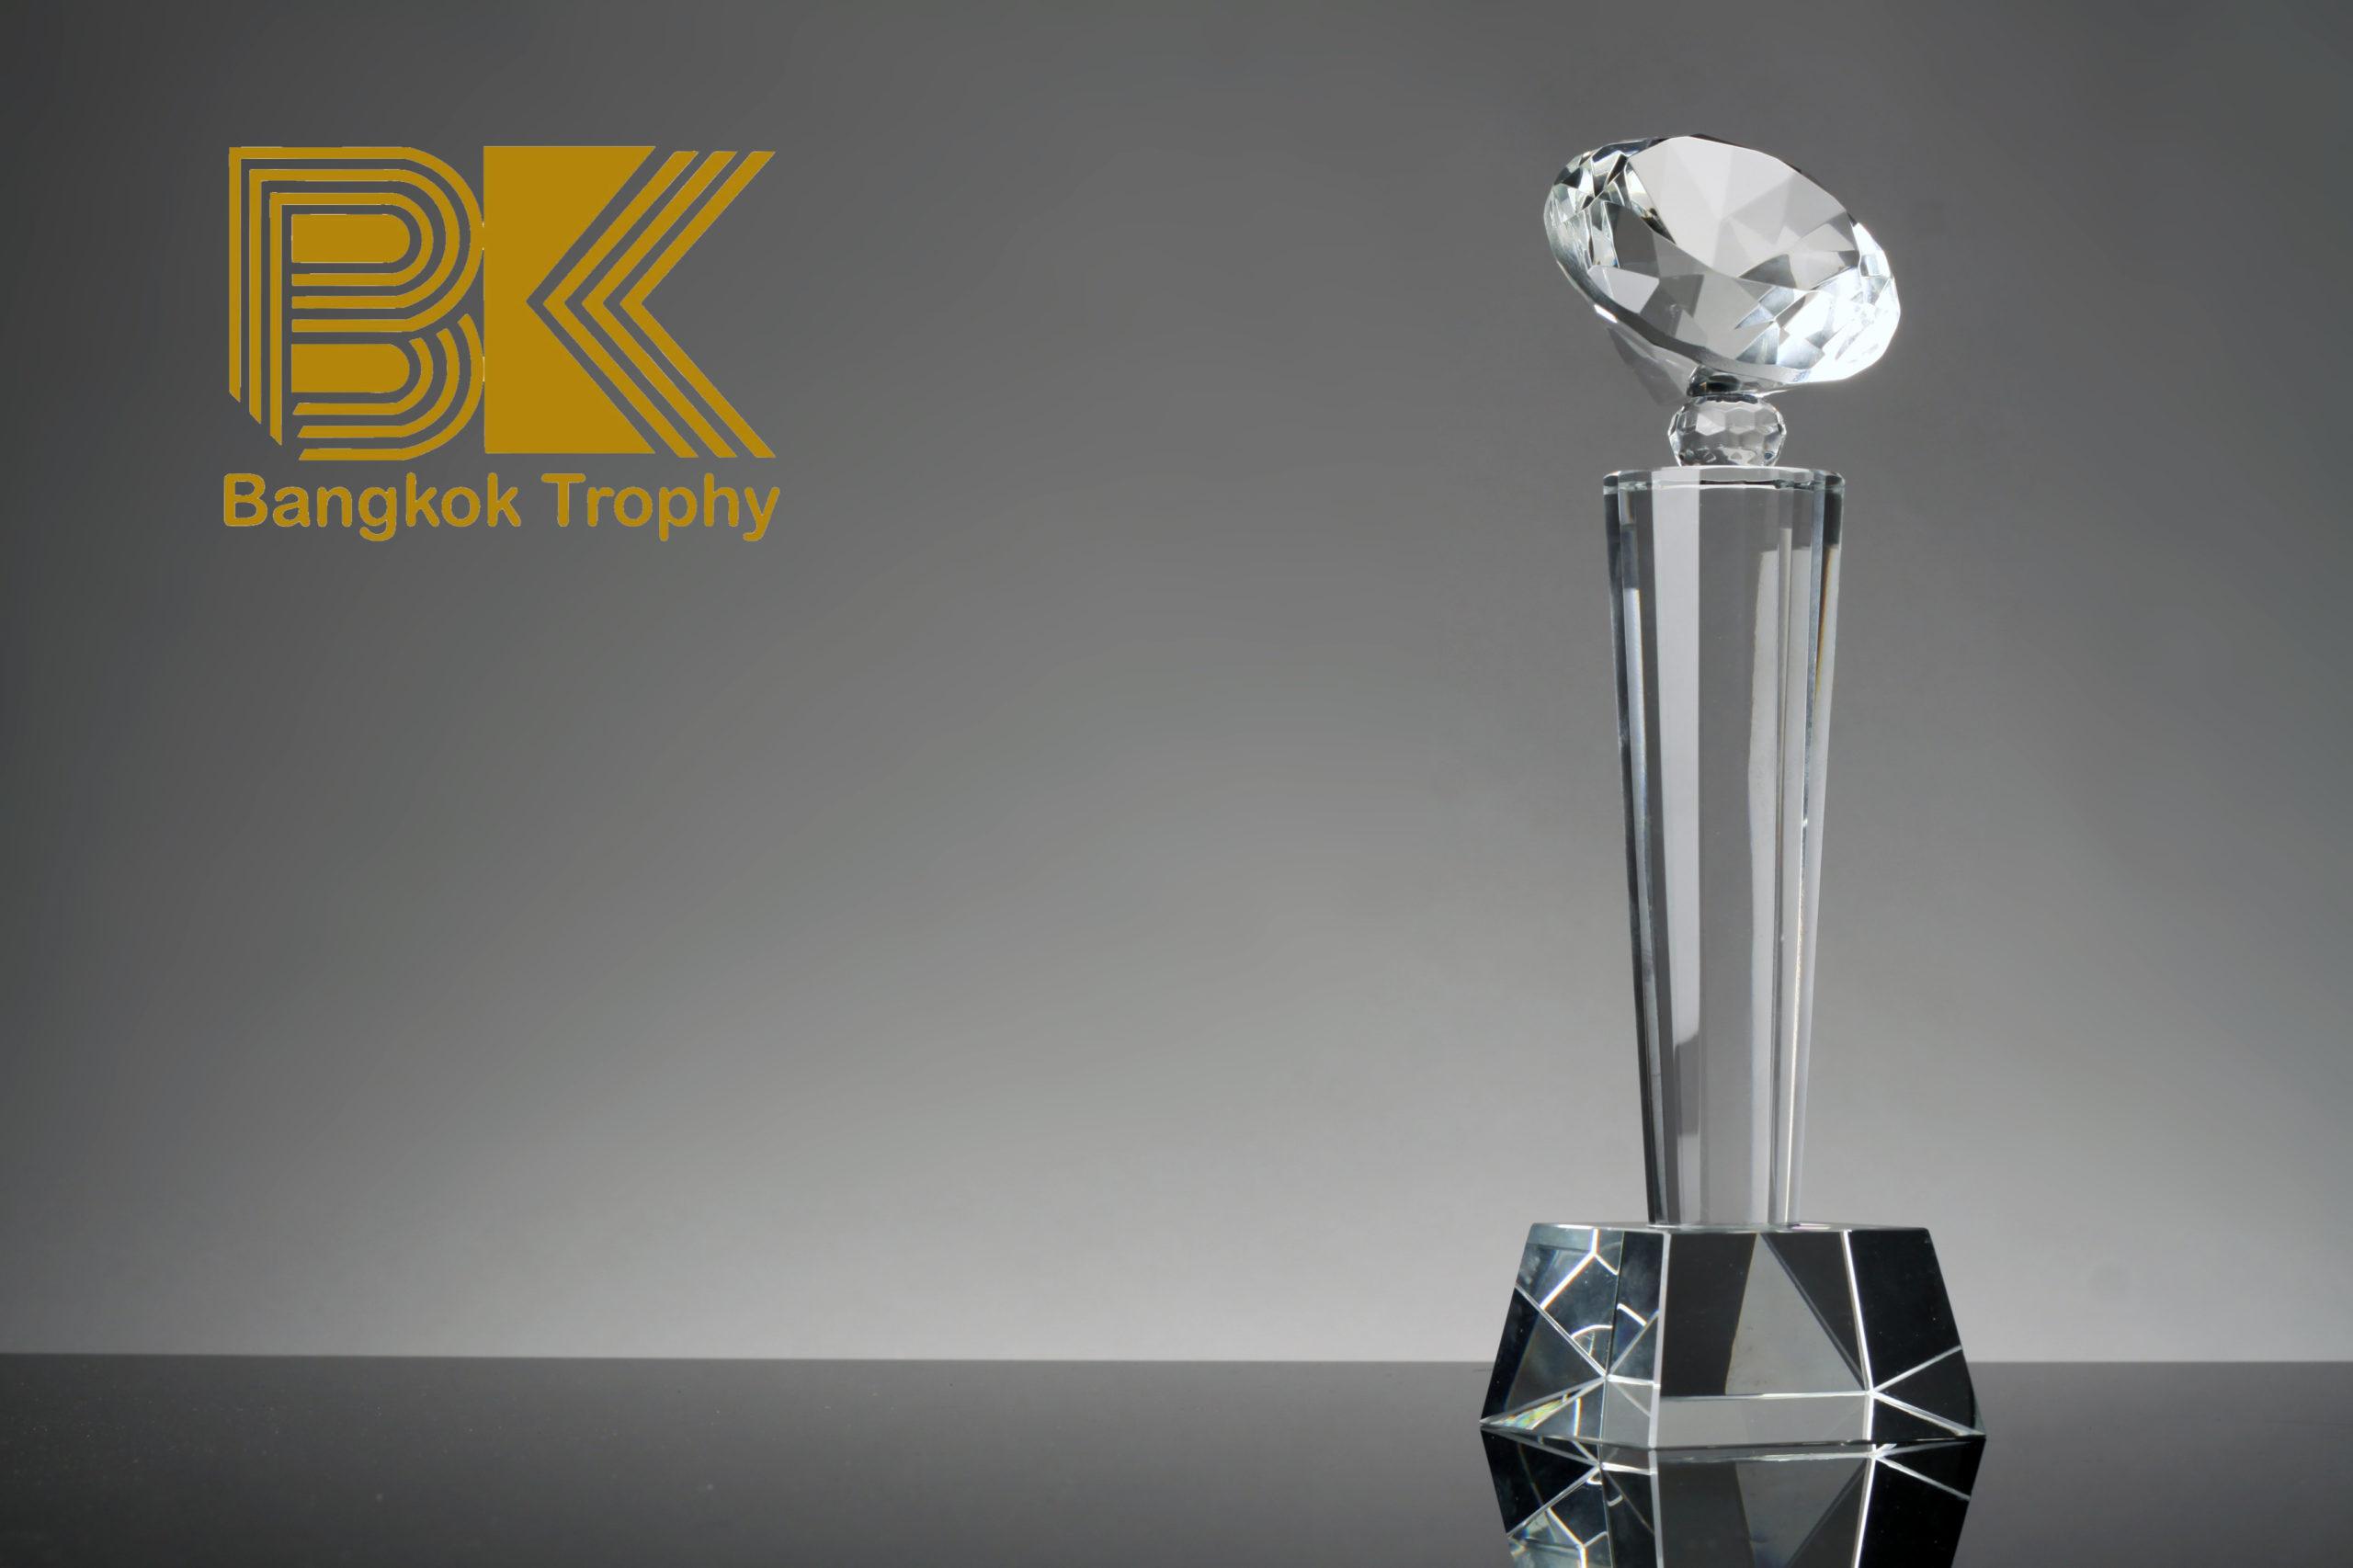 BK Crystal trophy